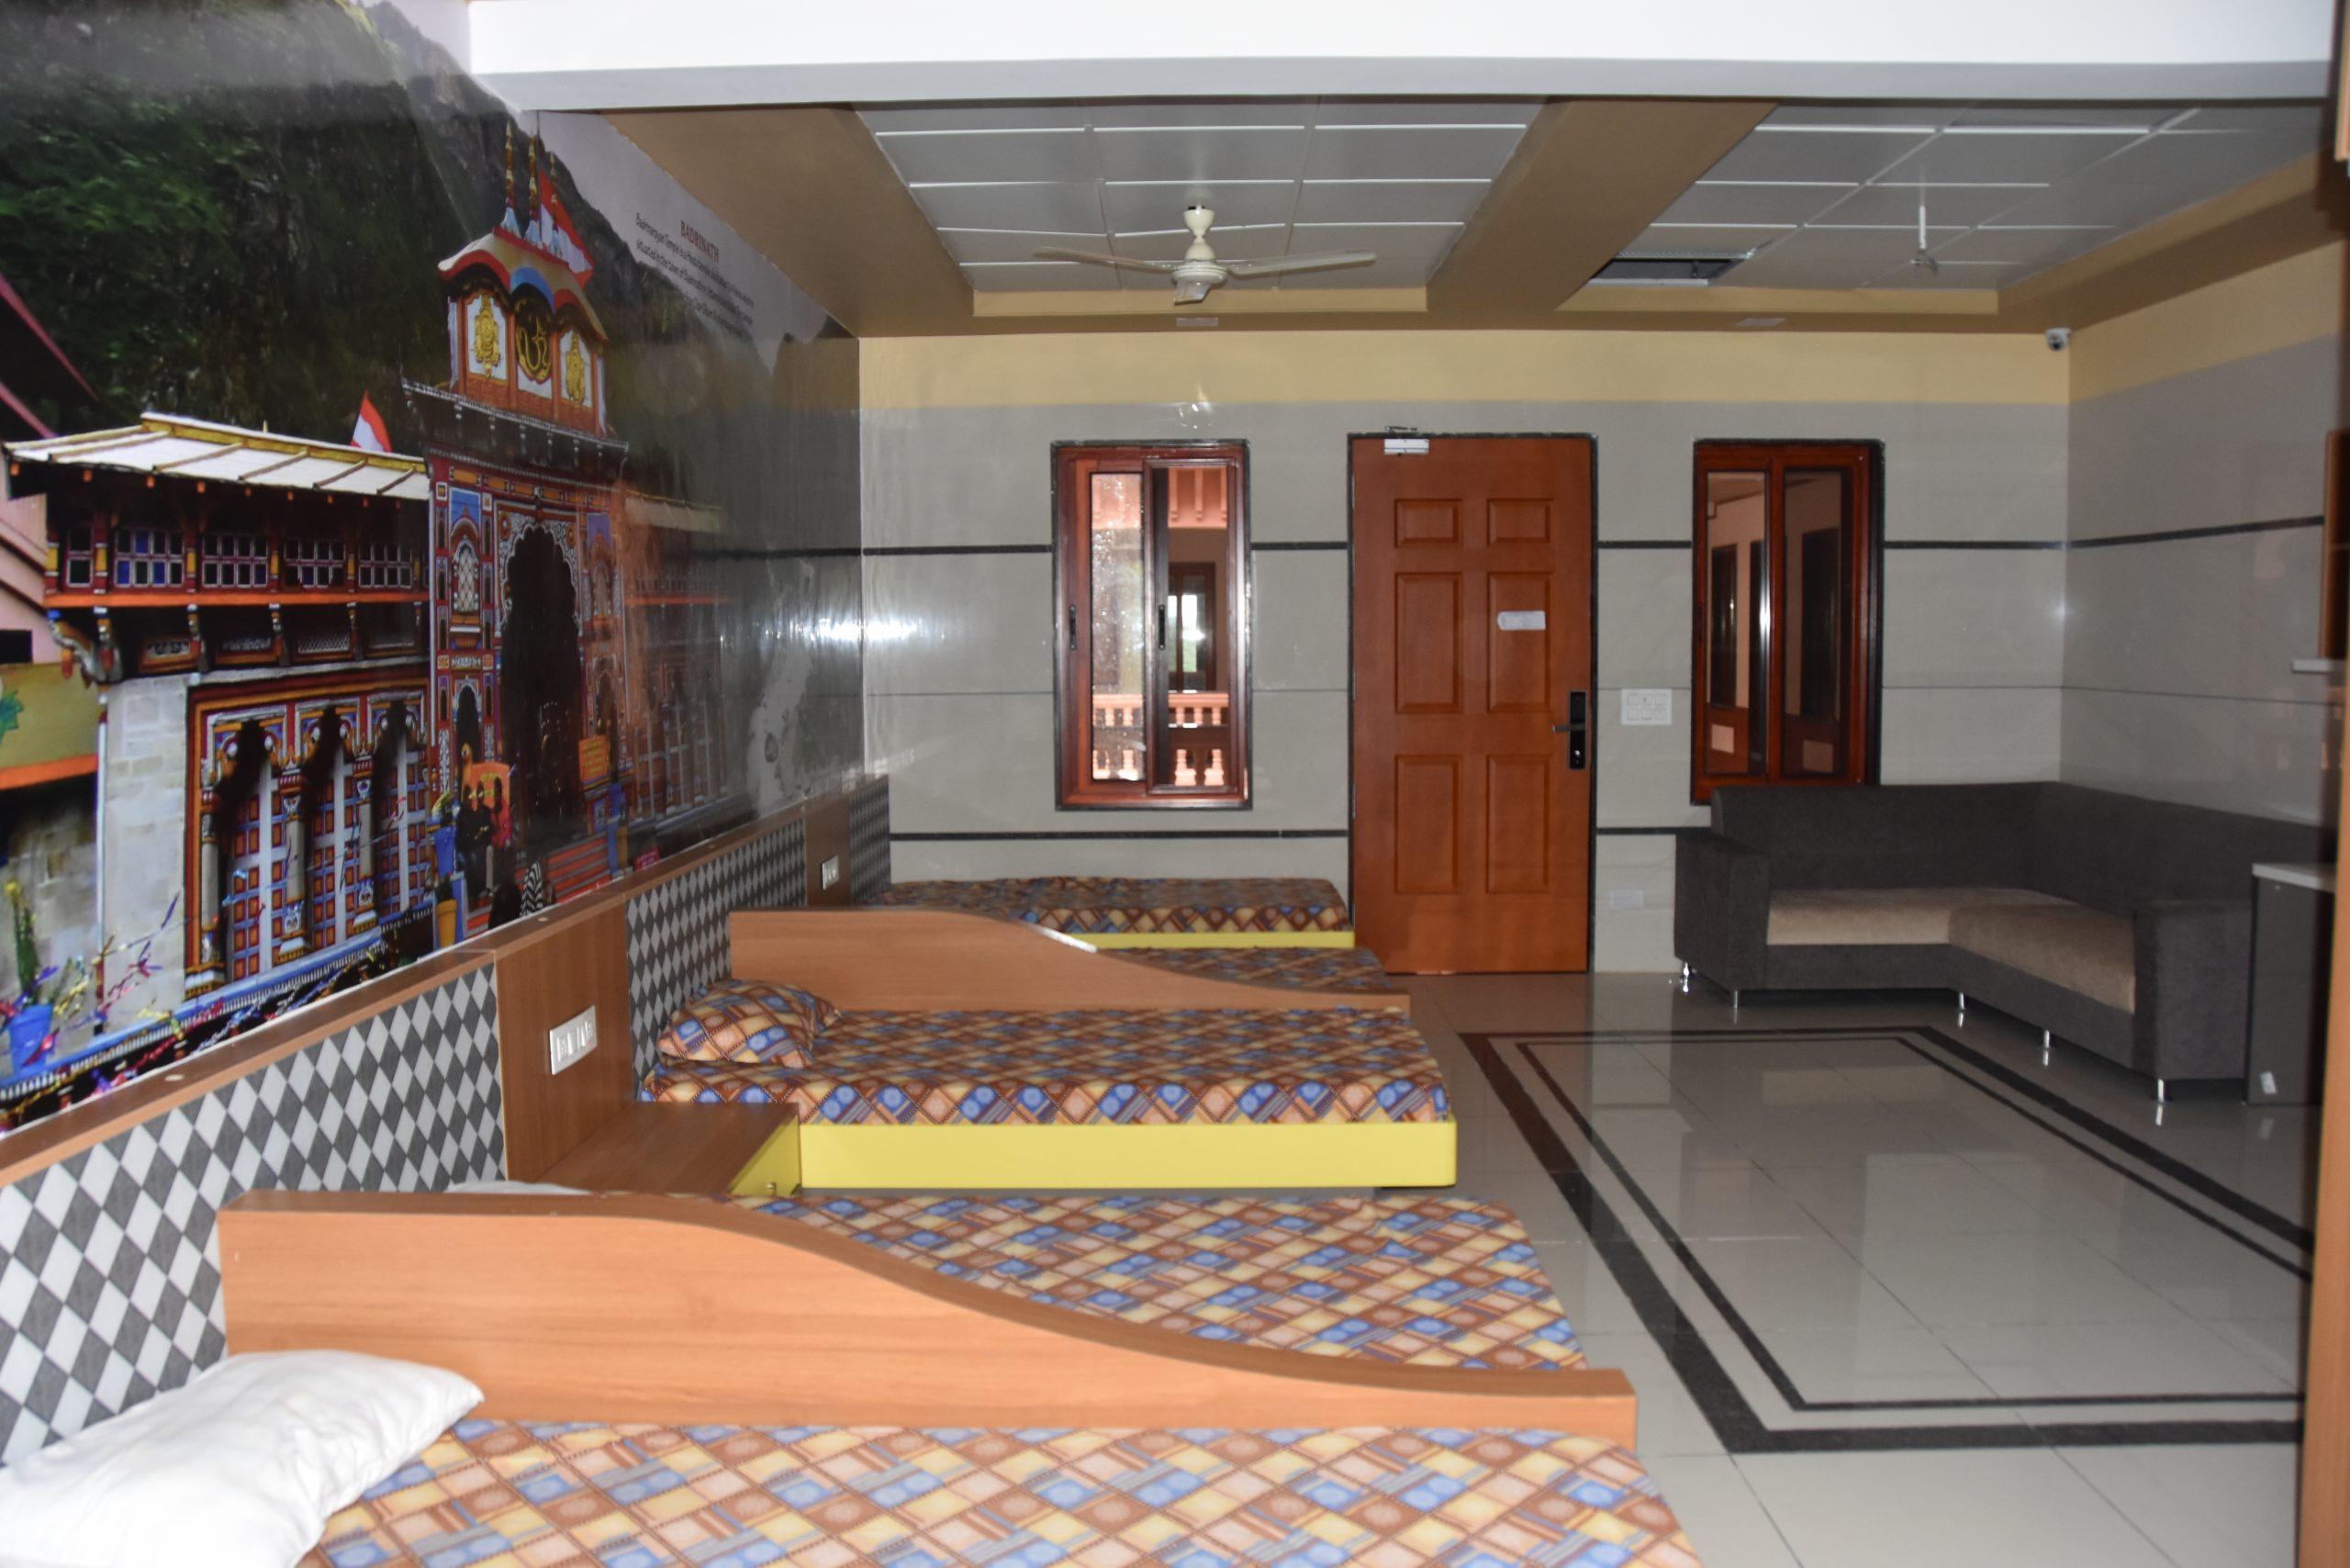 SHREE NEELAKANTH VIDYAPEETH Hostel